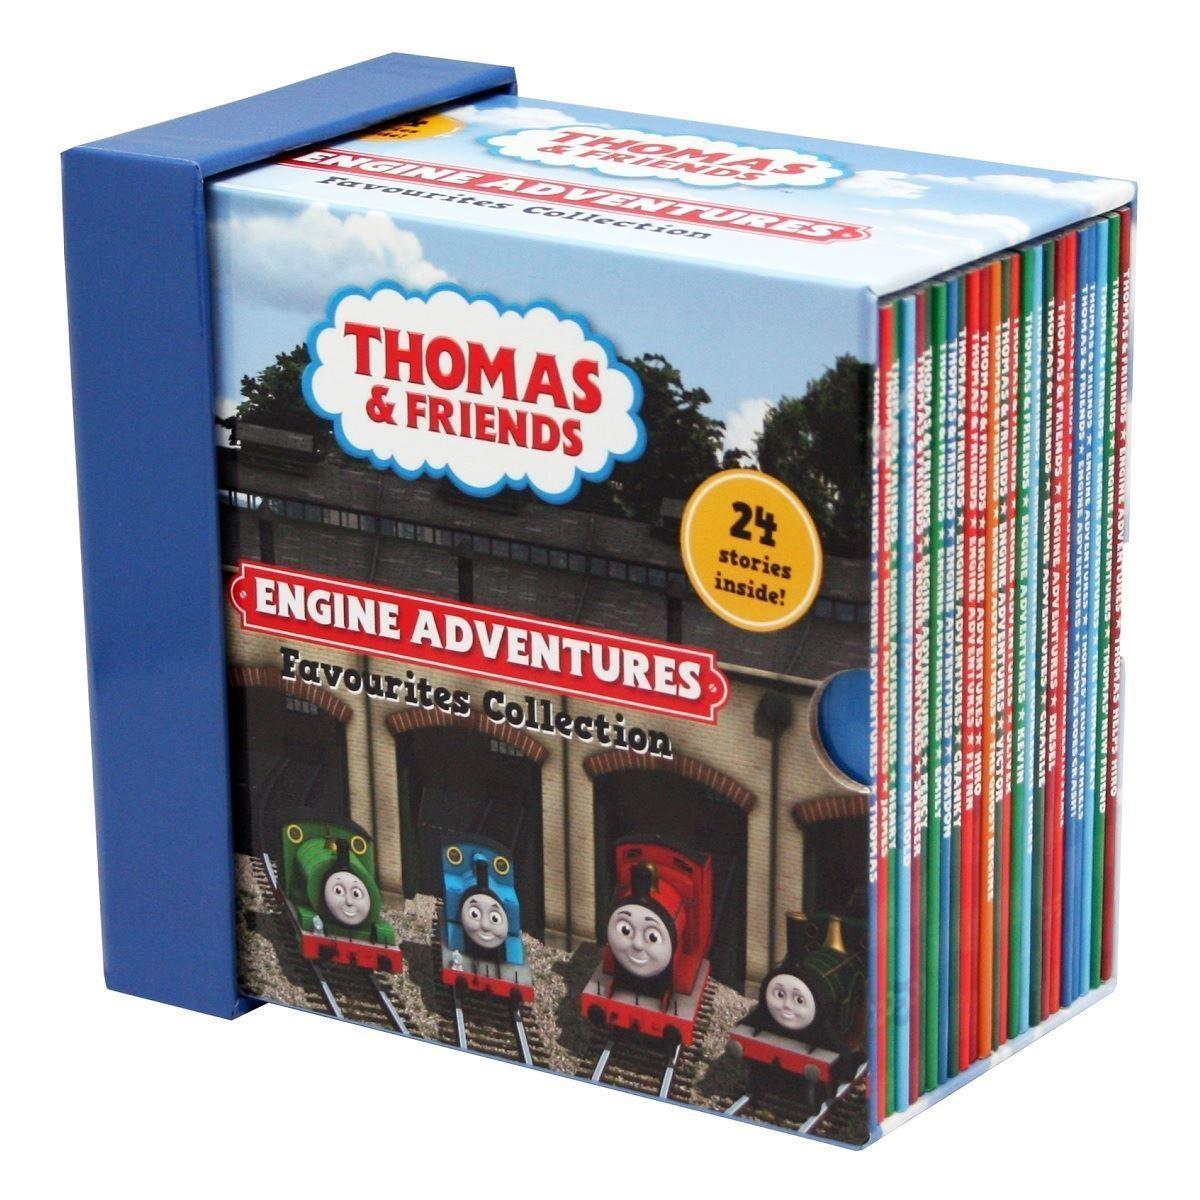 Thomas & Friends Engine Adventures image